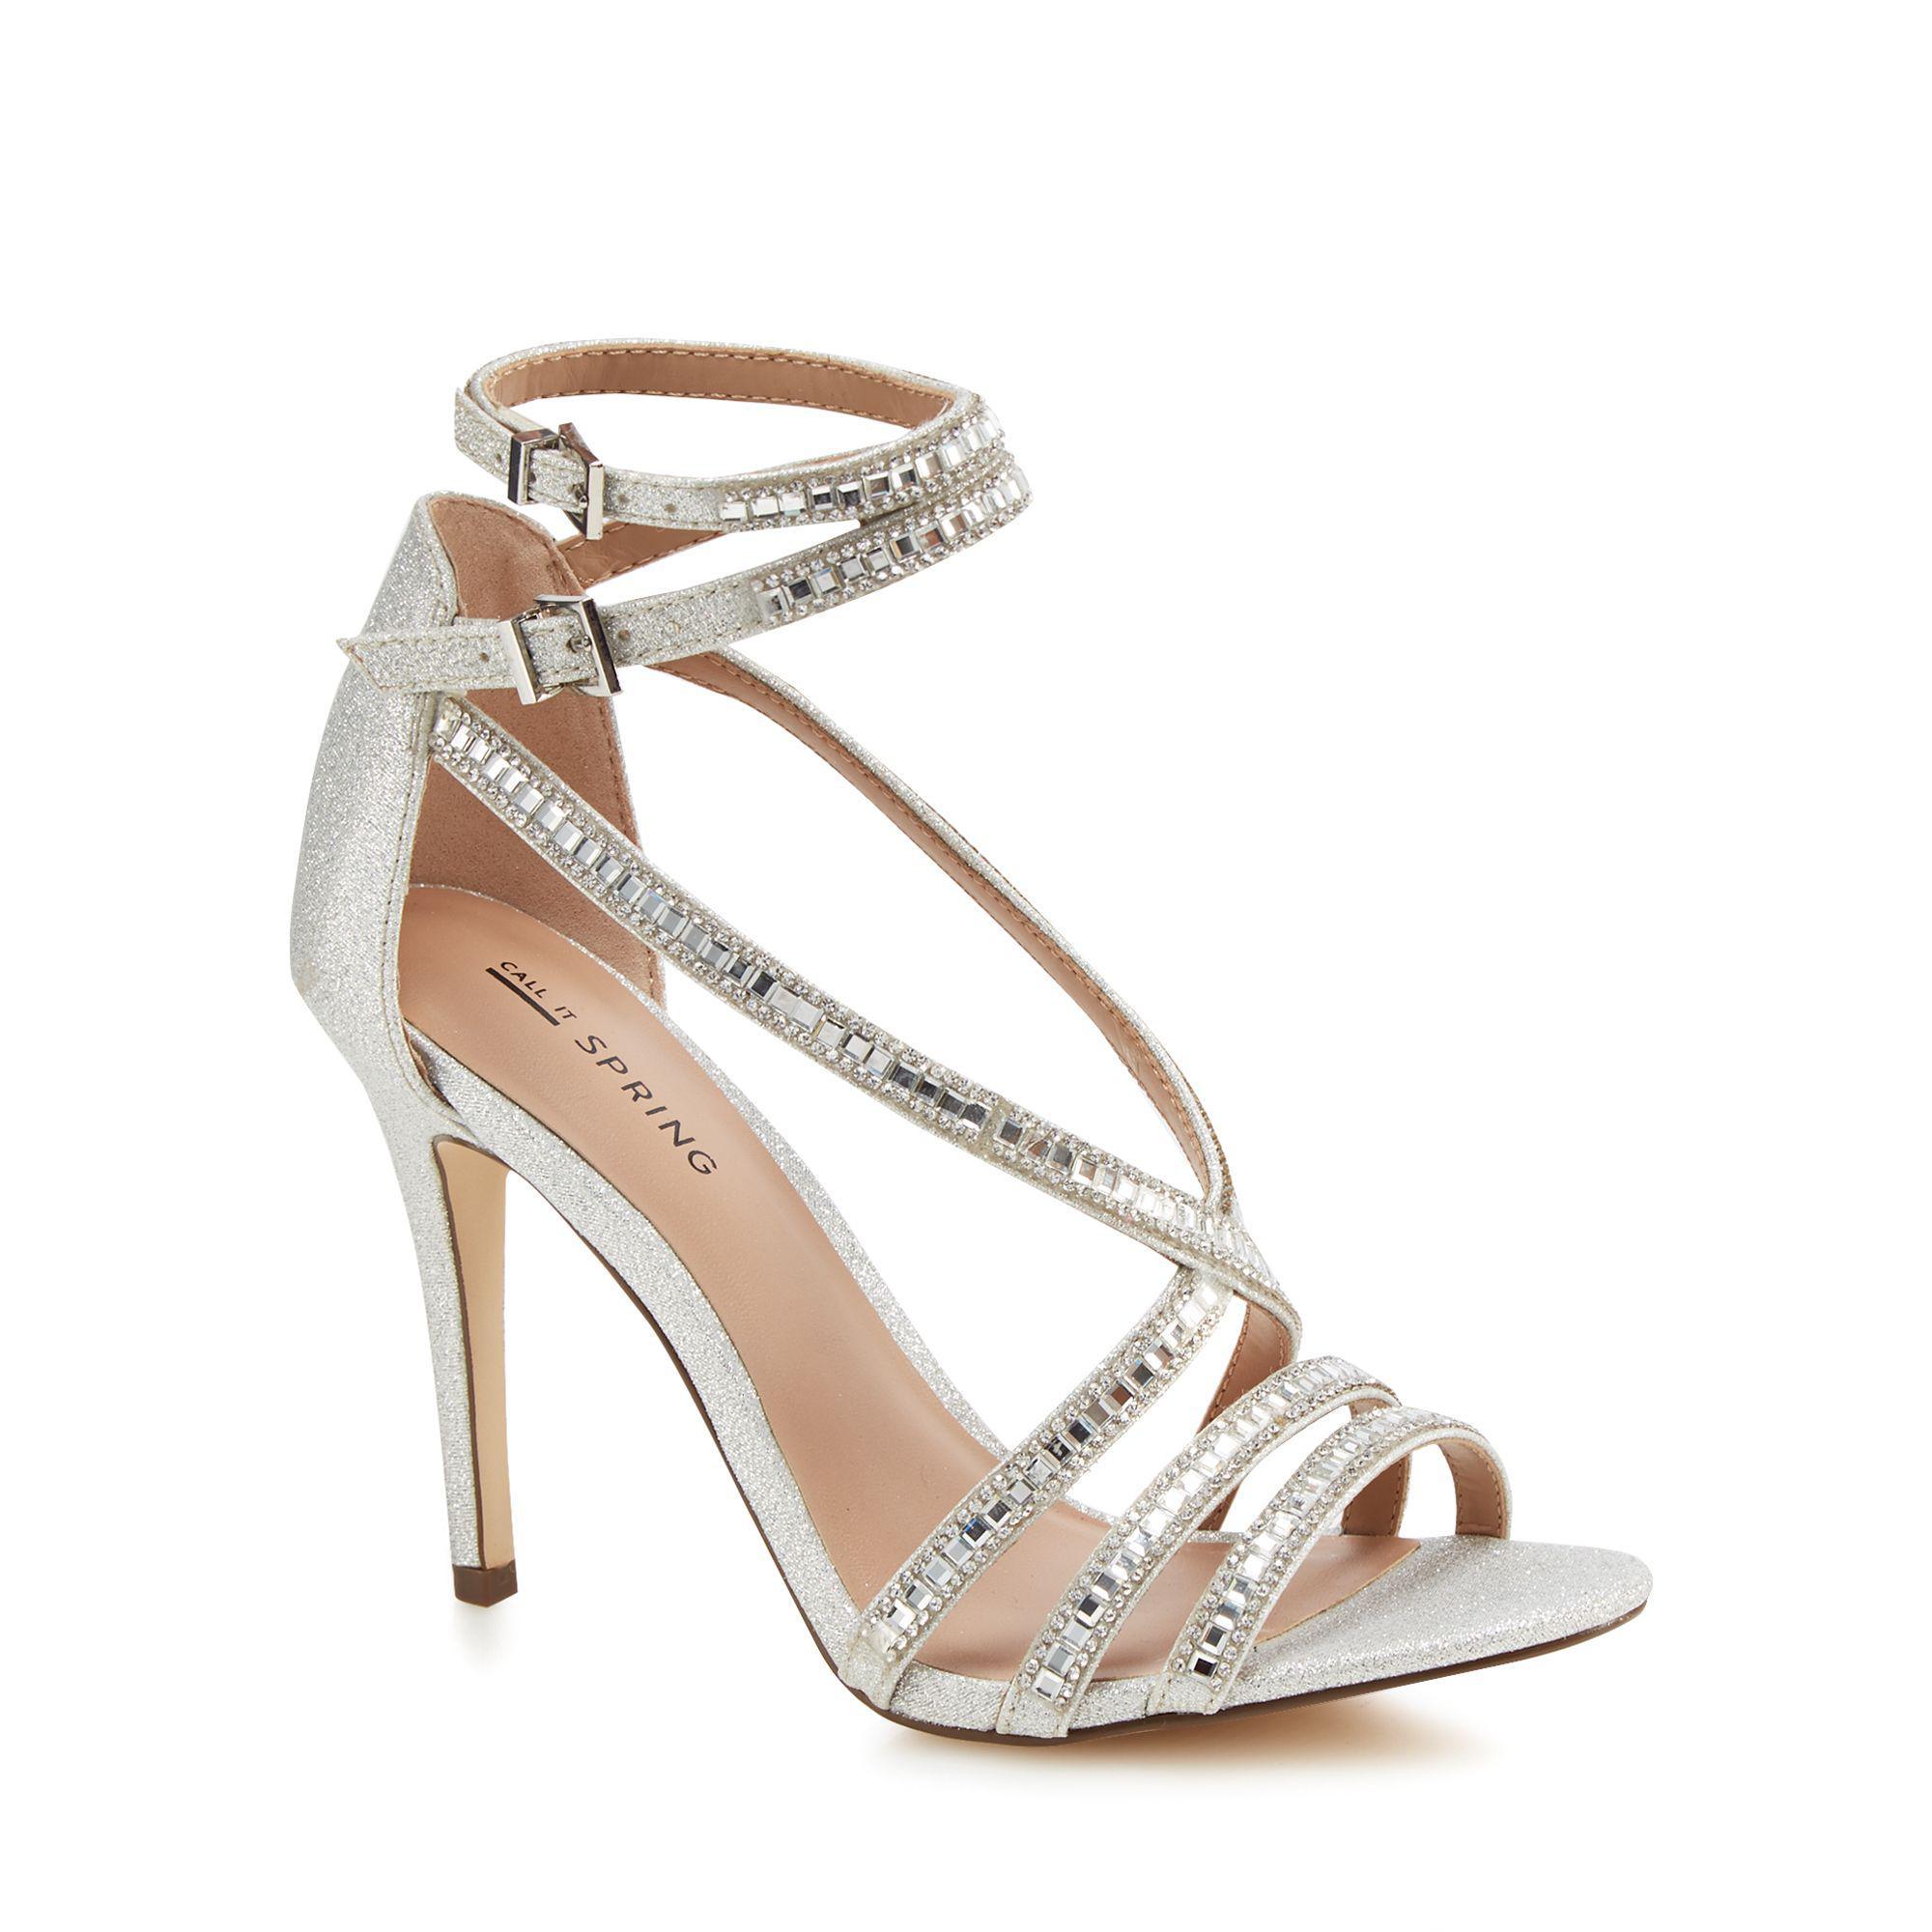 Silver glitter 'Gaffigan' high stiletto heel ankle strap sandals 100% original for sale NcxeAaP7X